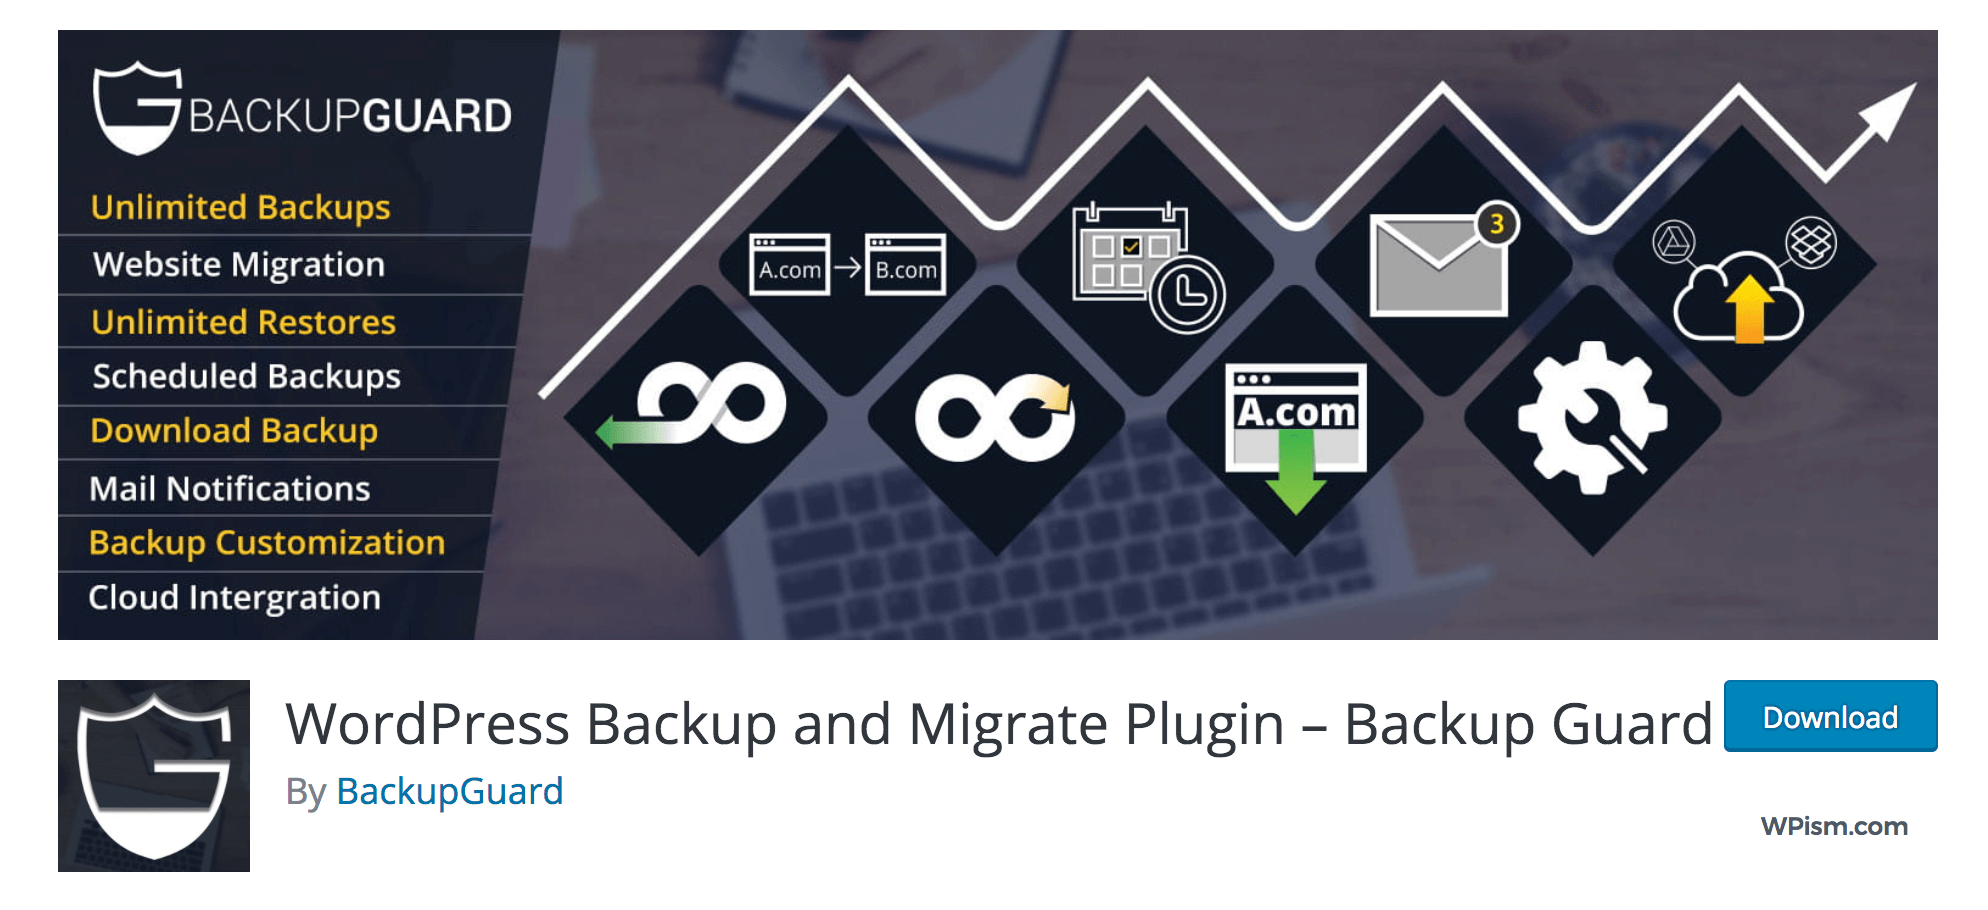 BackupGuard WordPress Plugin download Migration